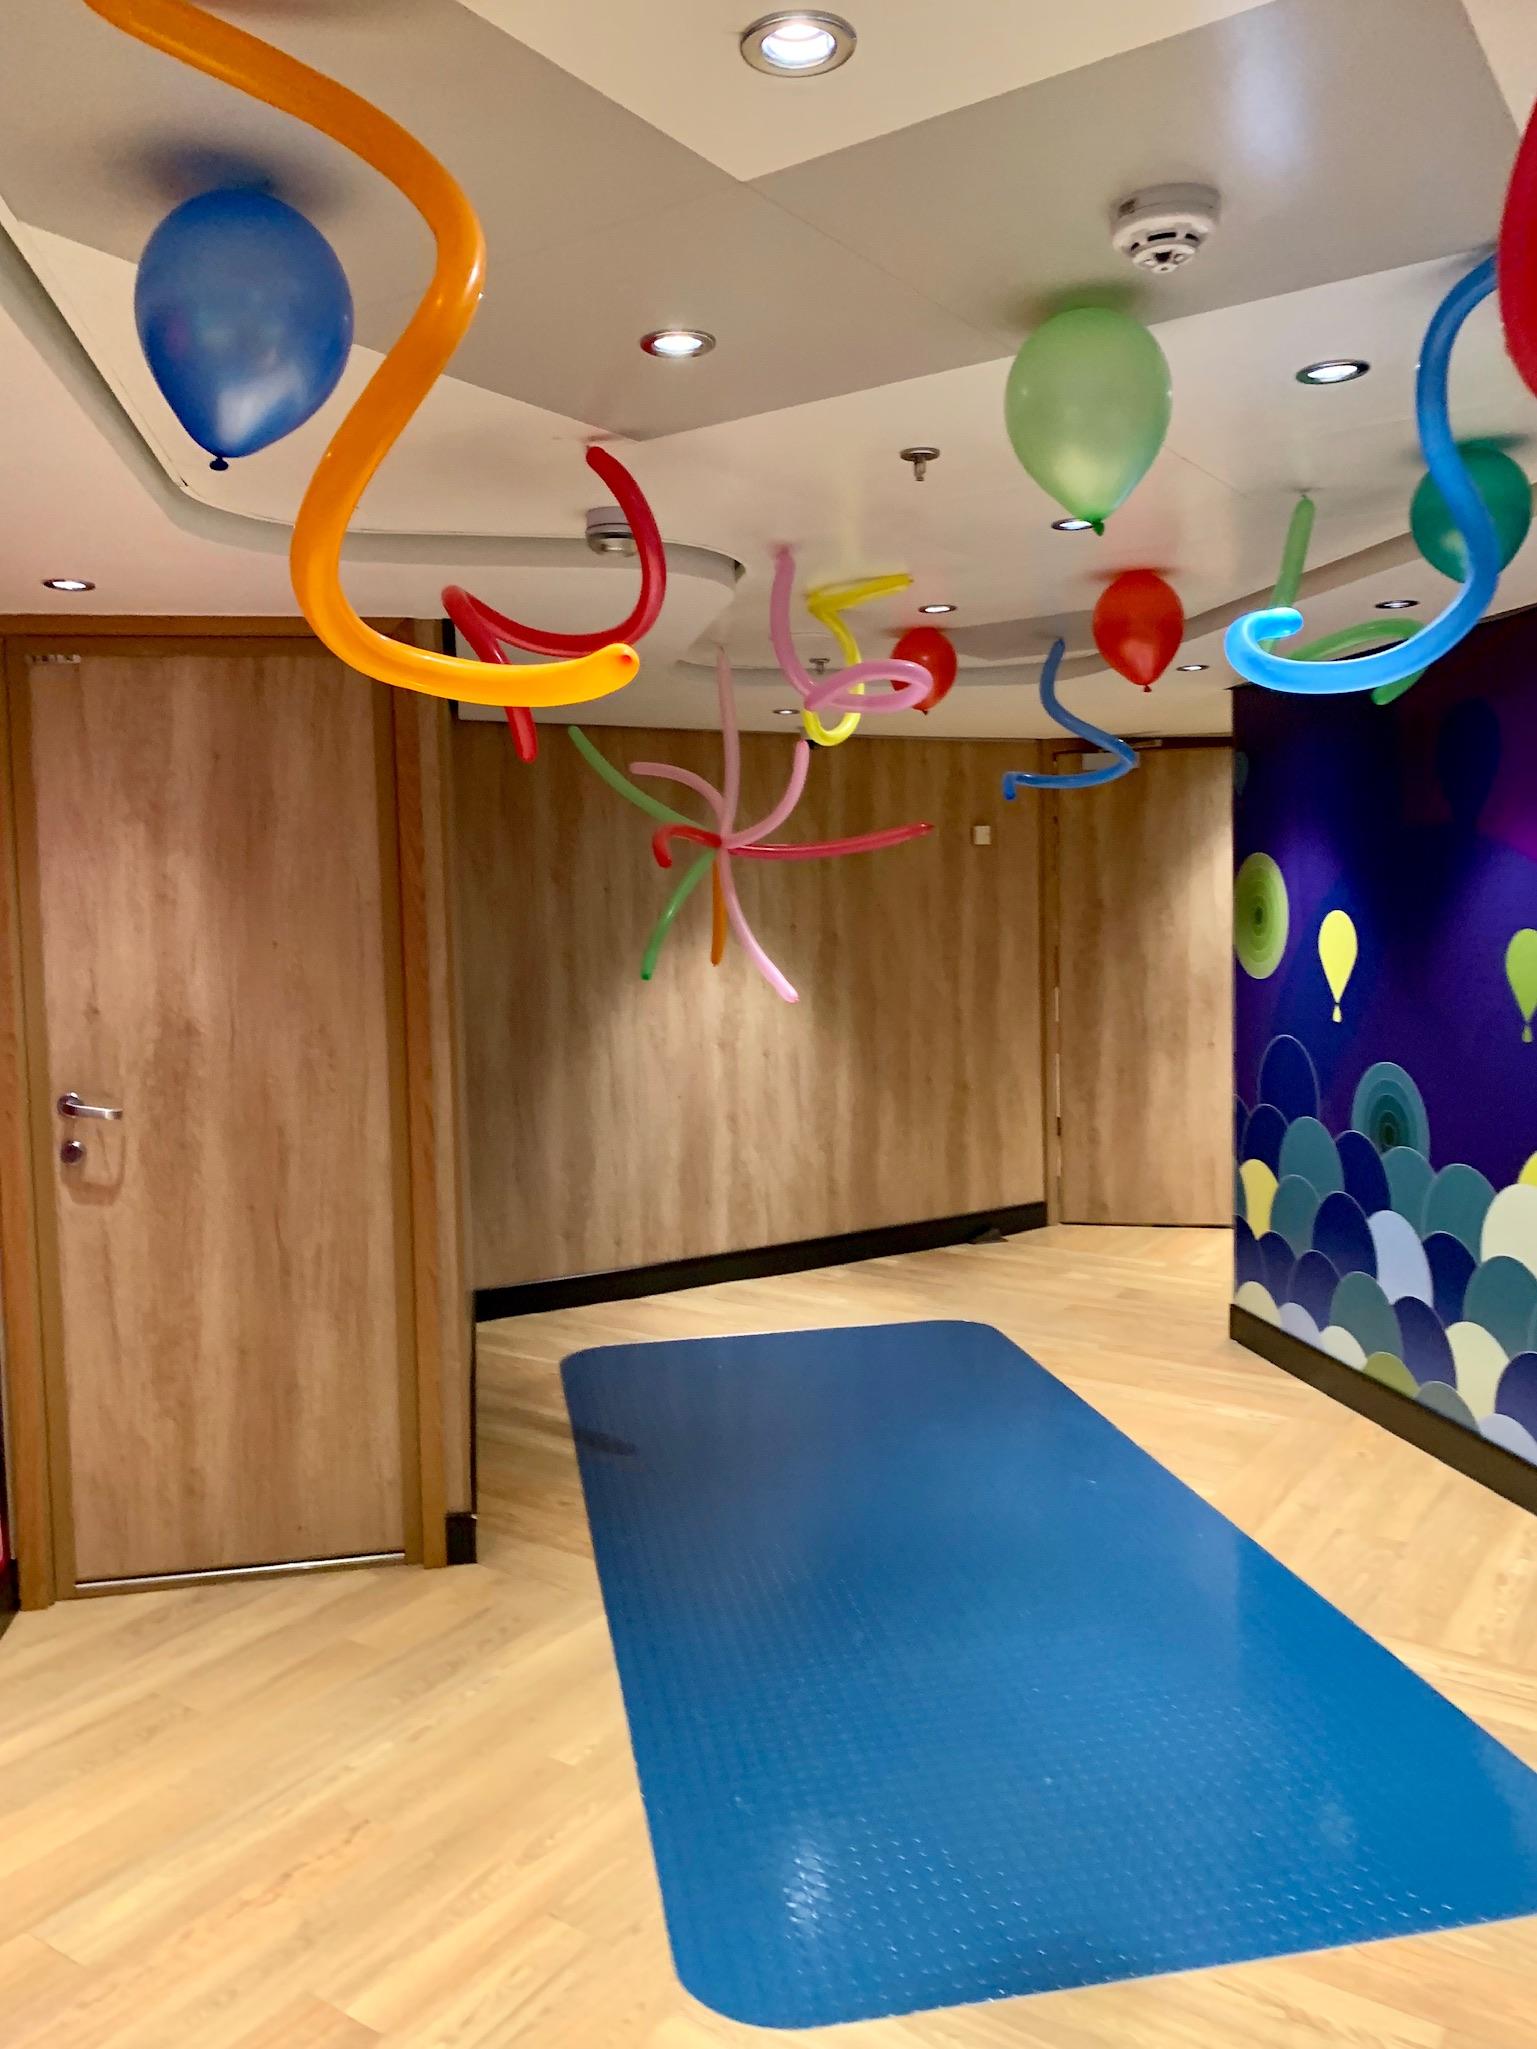 NCL Joy - Amenities - Splash Club entrance hallway.jpg